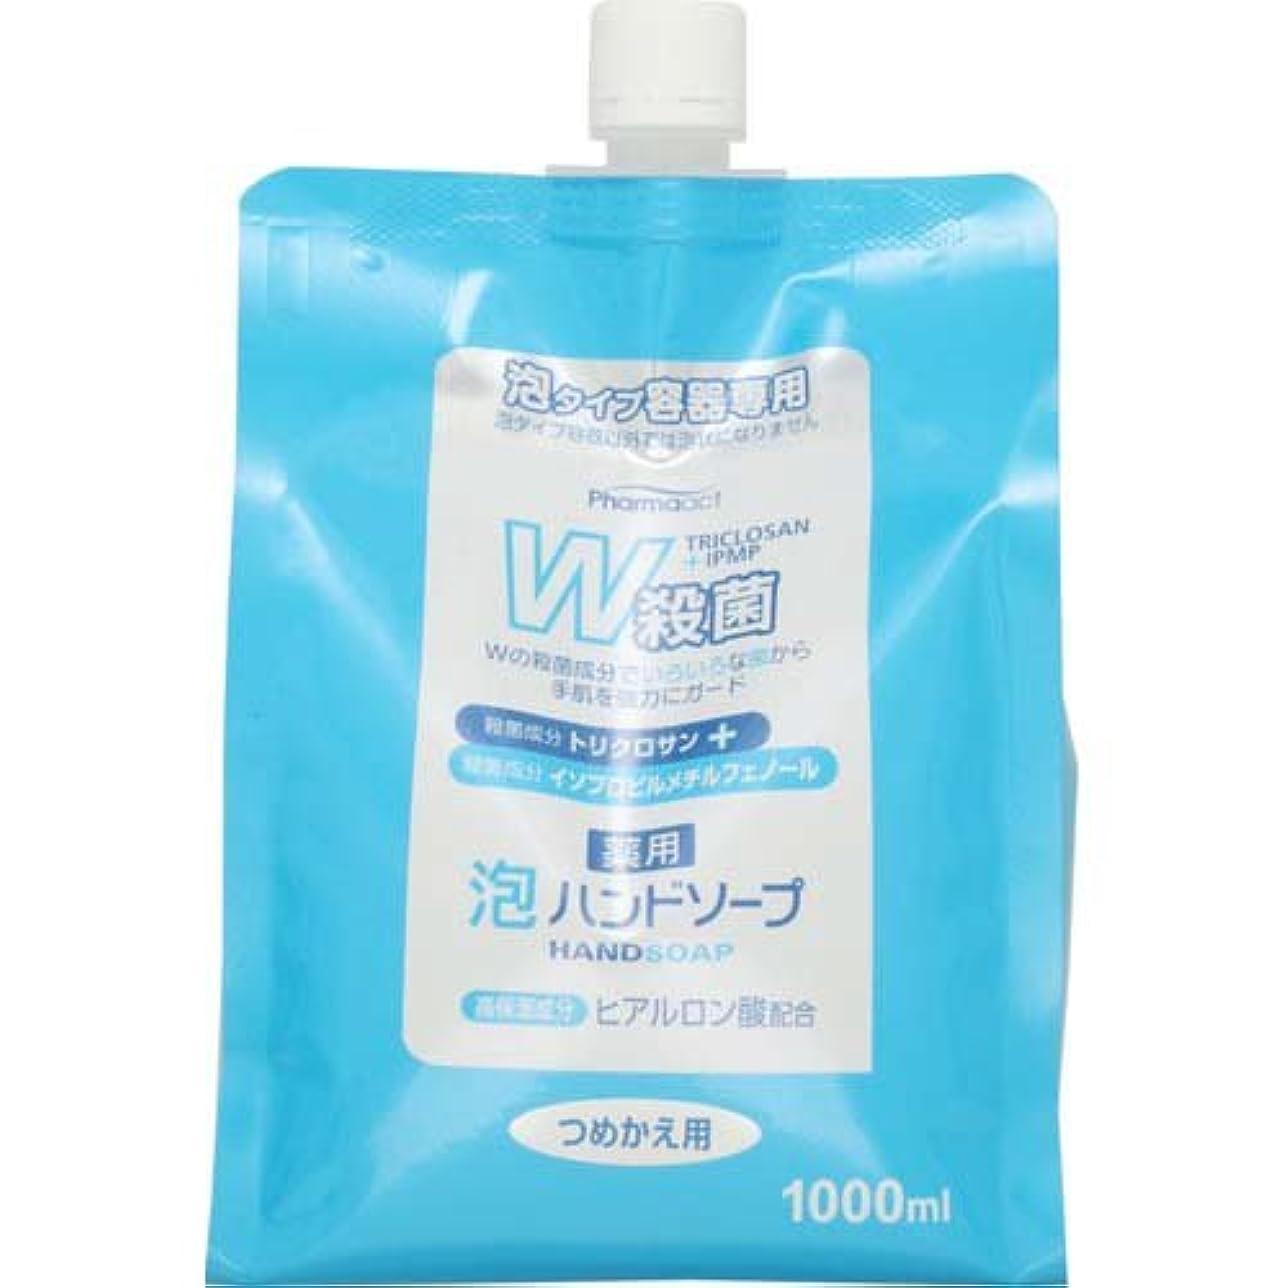 PHARMAACT(ファーマアクト) W殺菌薬用泡ハンドソープ スパウト付き詰替 1000ml